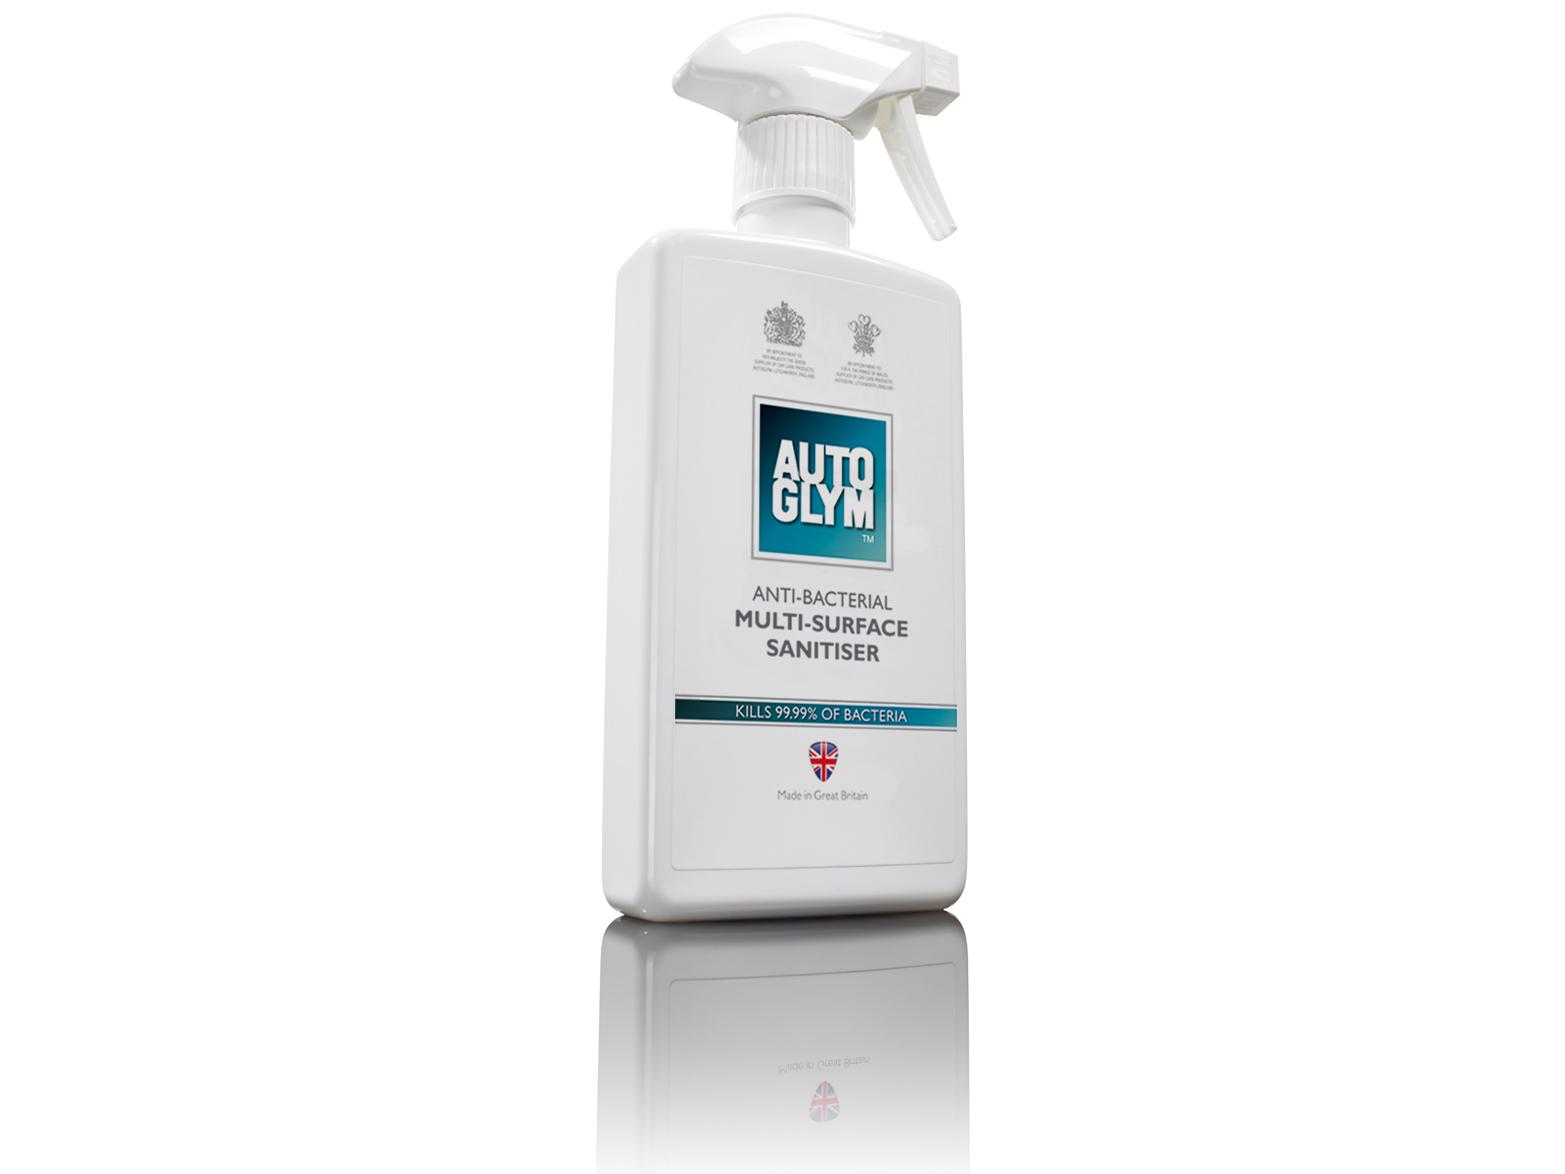 Autoglym Multi-Surface Sanitiser (500ml)